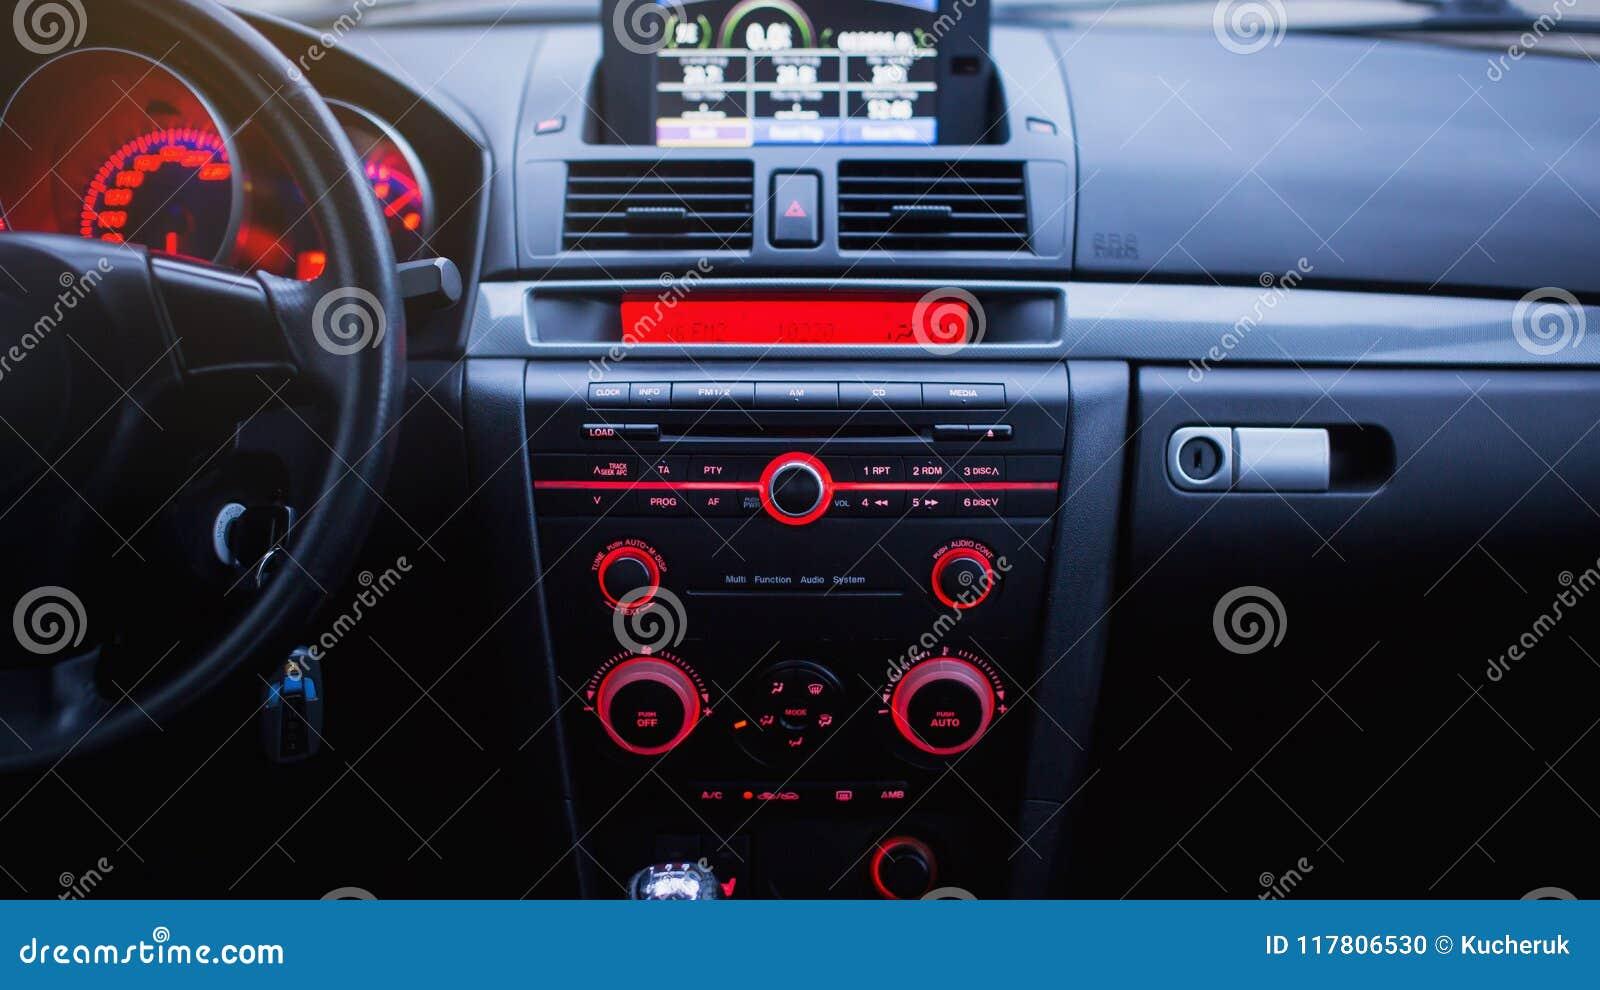 Air conditioner button